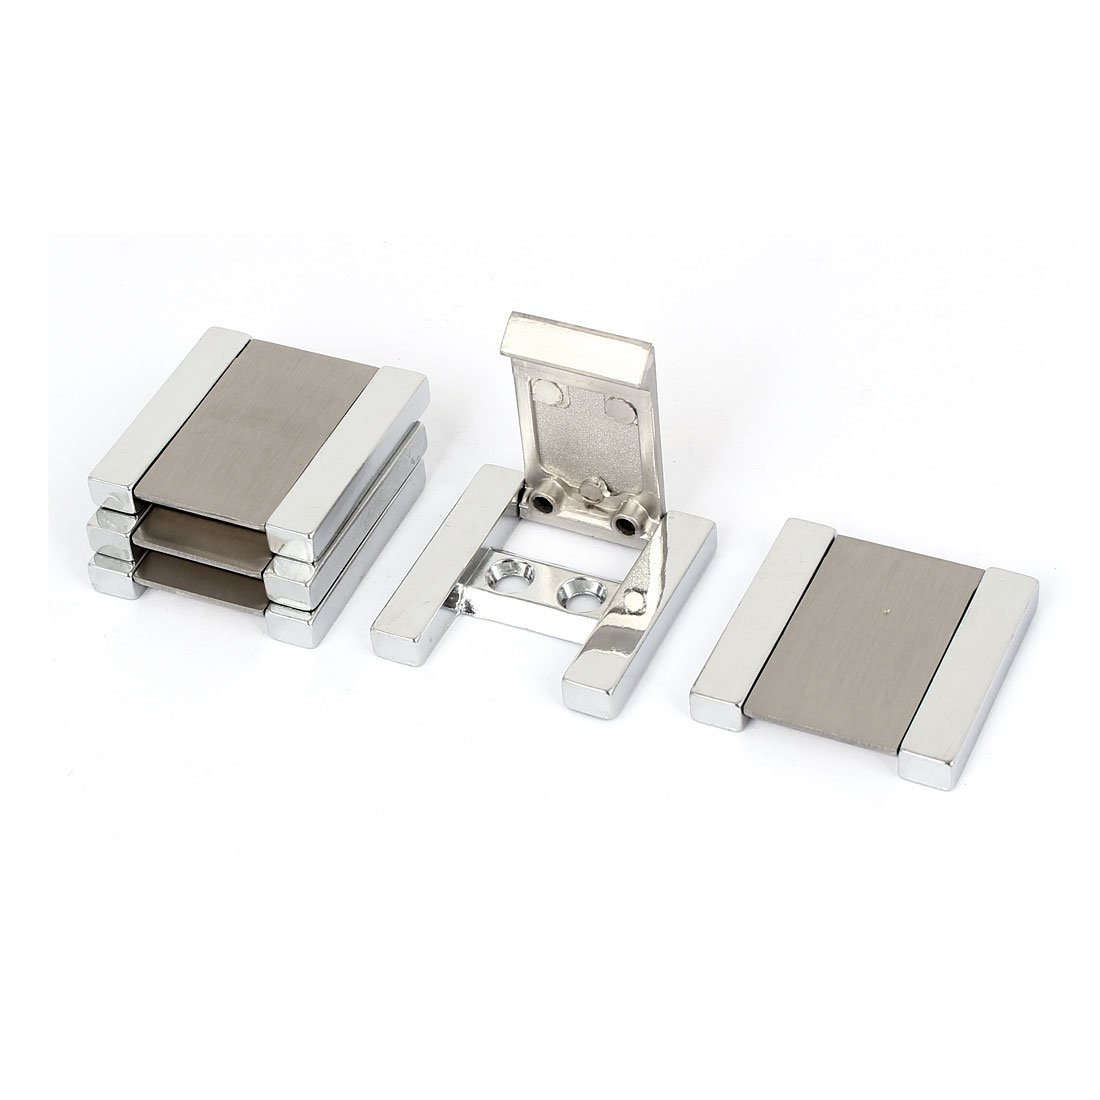 sourcingmap® Cabinet Drawer Door Square Shape Metal Flush Pull Handle 5pcs a16071200ux0342